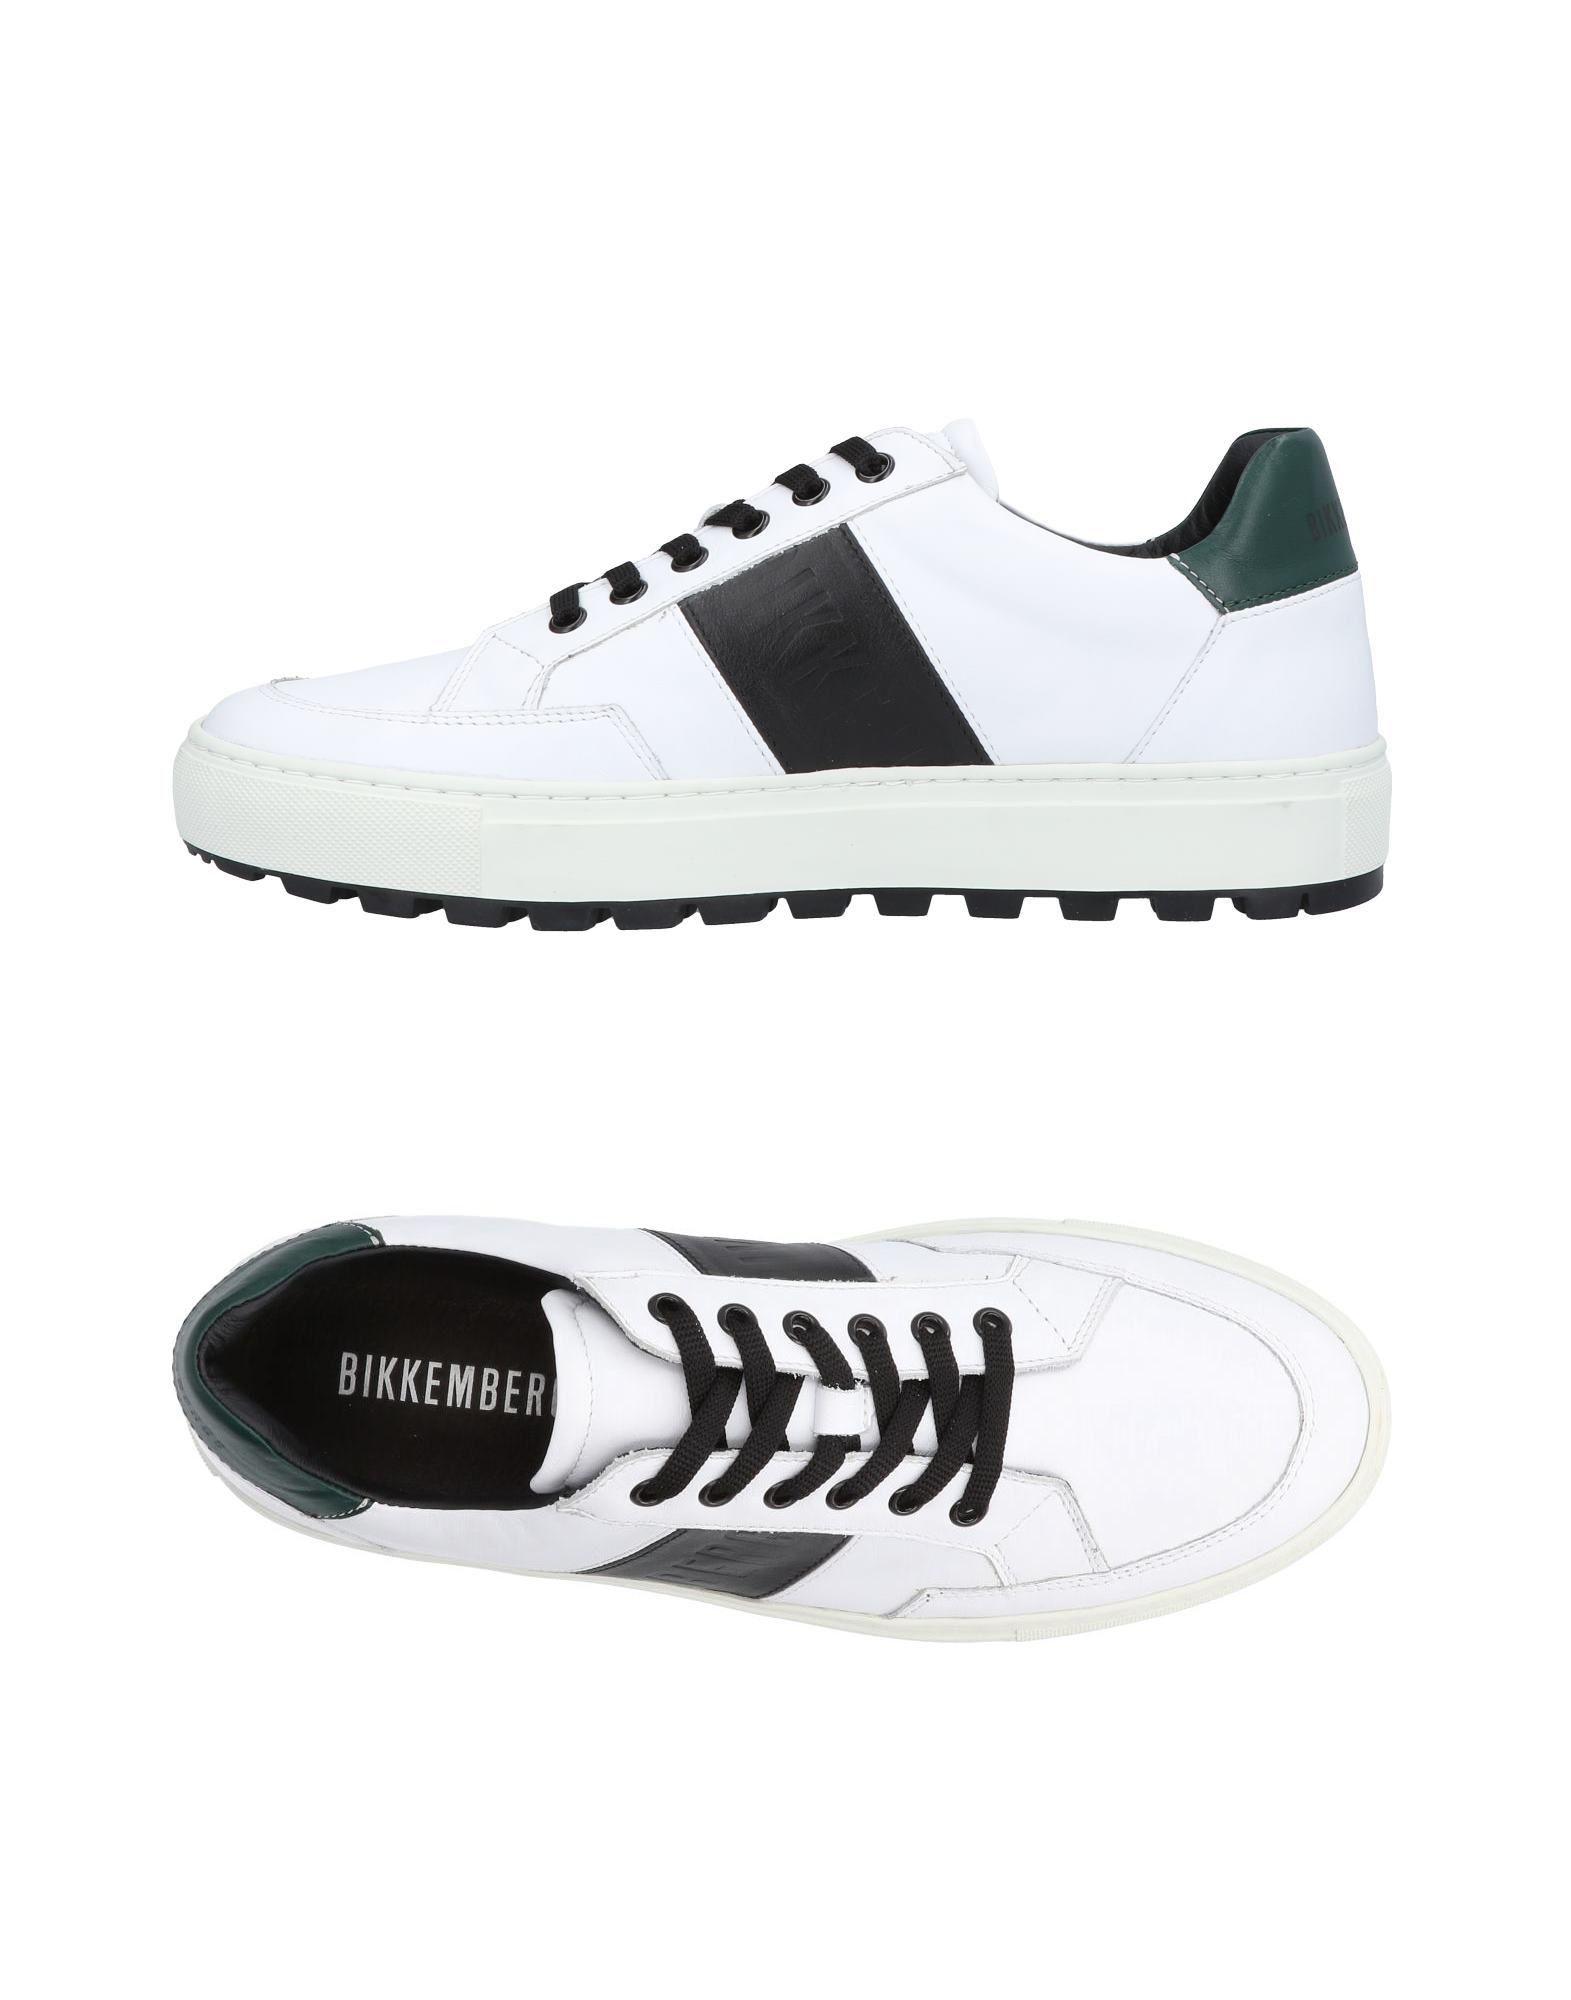 Moda Sneakers Bikkembergs Uomo Uomo Bikkembergs - 11451075WB 2313bd